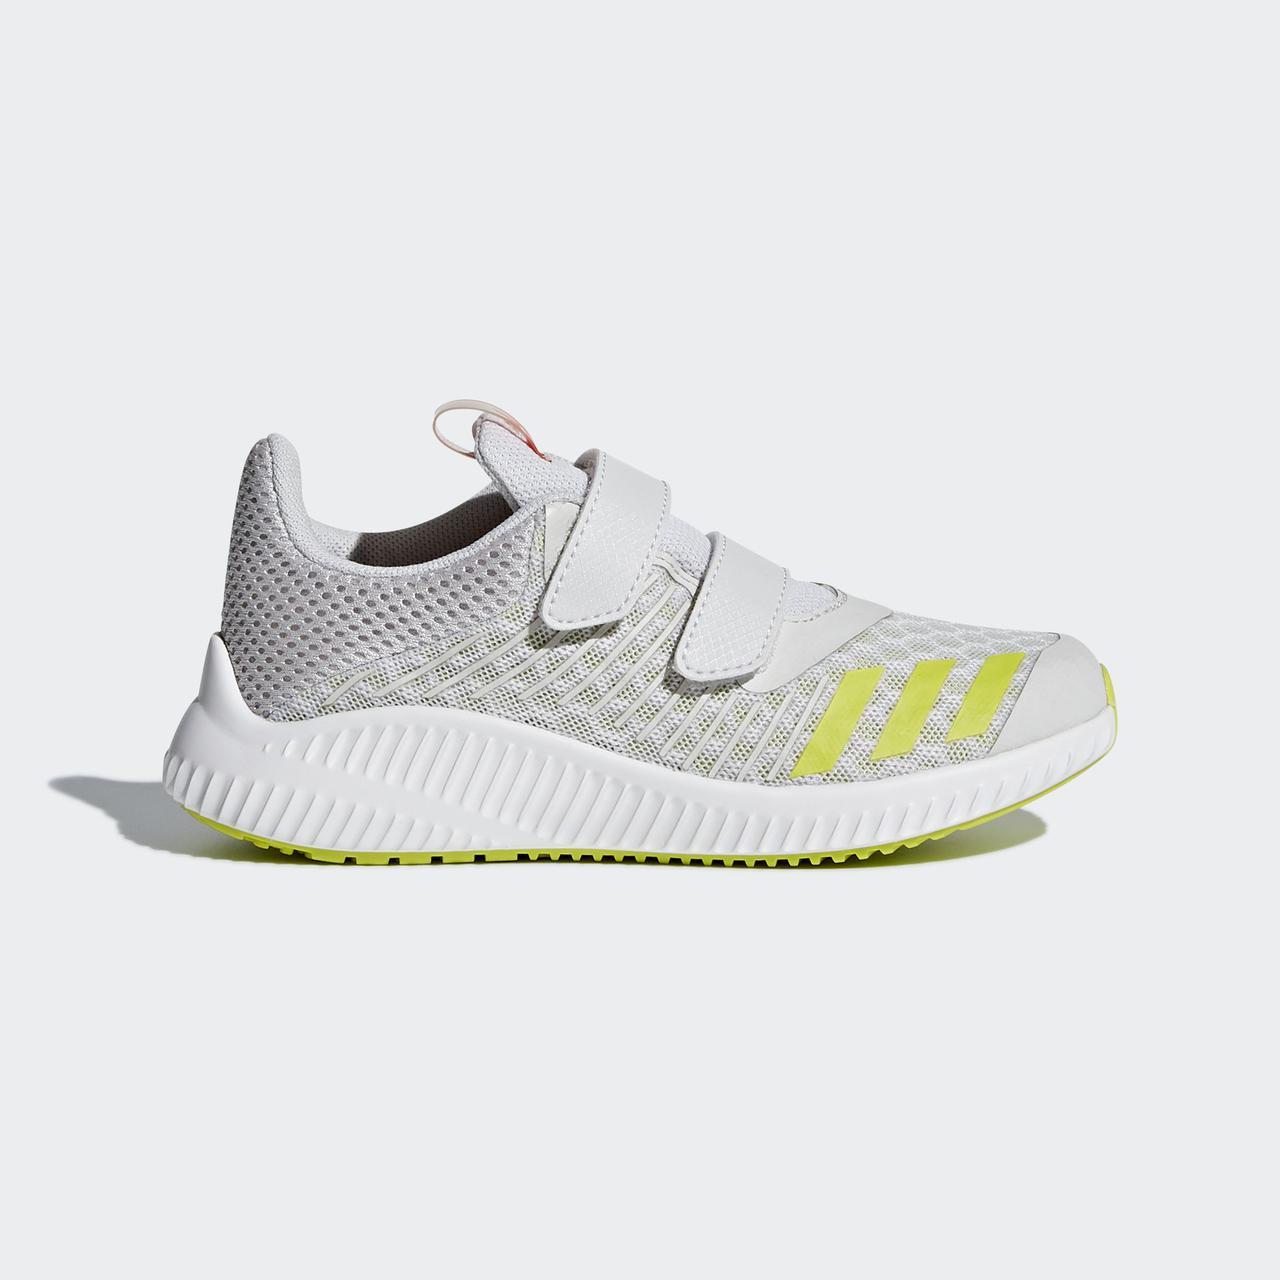 11fc8b6bd35c Детские кроссовки Adidas Performance Fortarun Cool (Артикул  DB0226) -  Интернет-магазин «